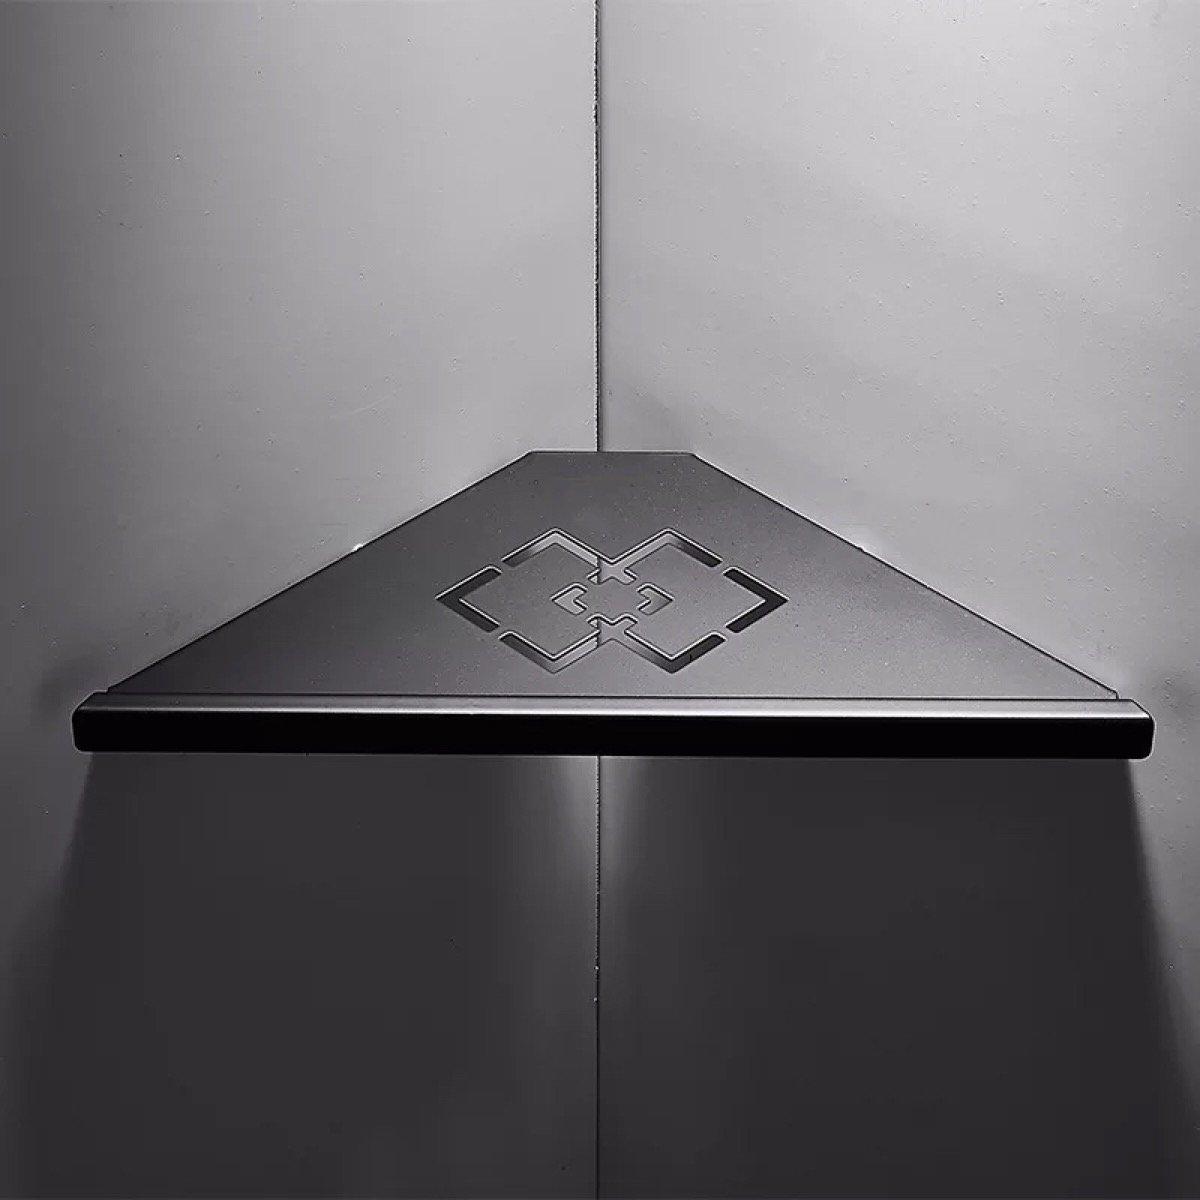 Us 15 99 20 Off Carved Hollow Out Black Matte Corner Shower Holder 304 Stainless Steel Bathroom Shelf 1 Layer In Bathroom Shelves From Home